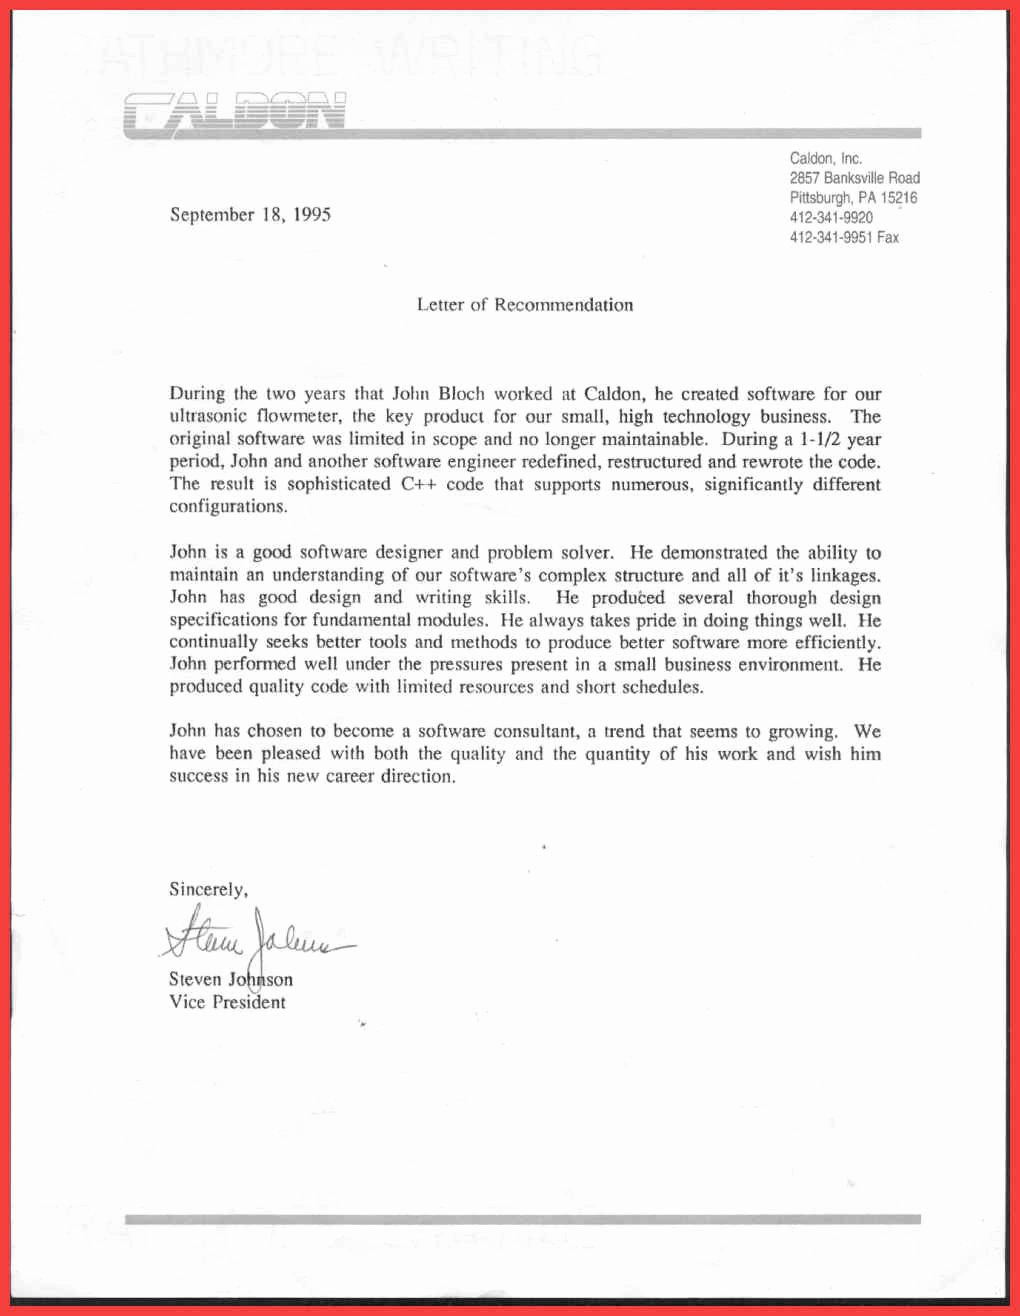 Eagle Scout Recommendation Letter New Eagle Re Mendation Letter